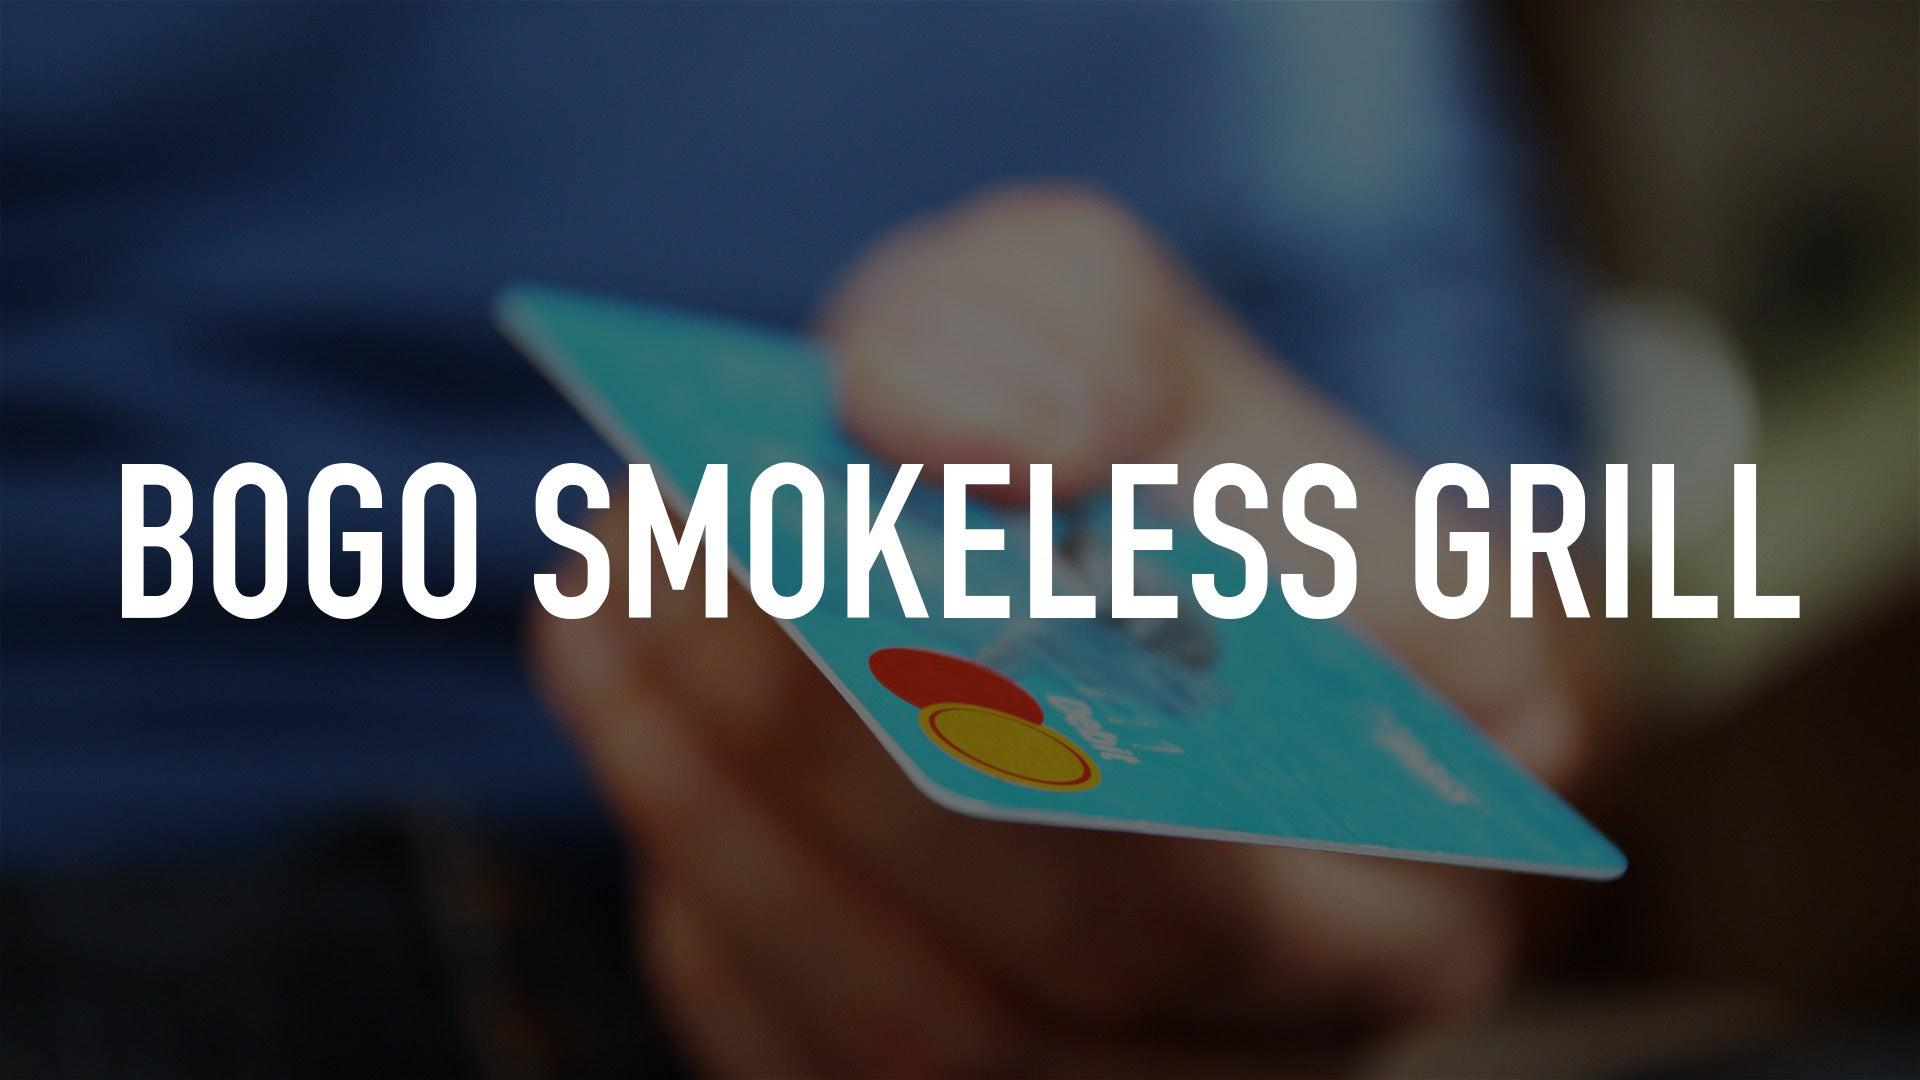 BOGO Smokeless Grill